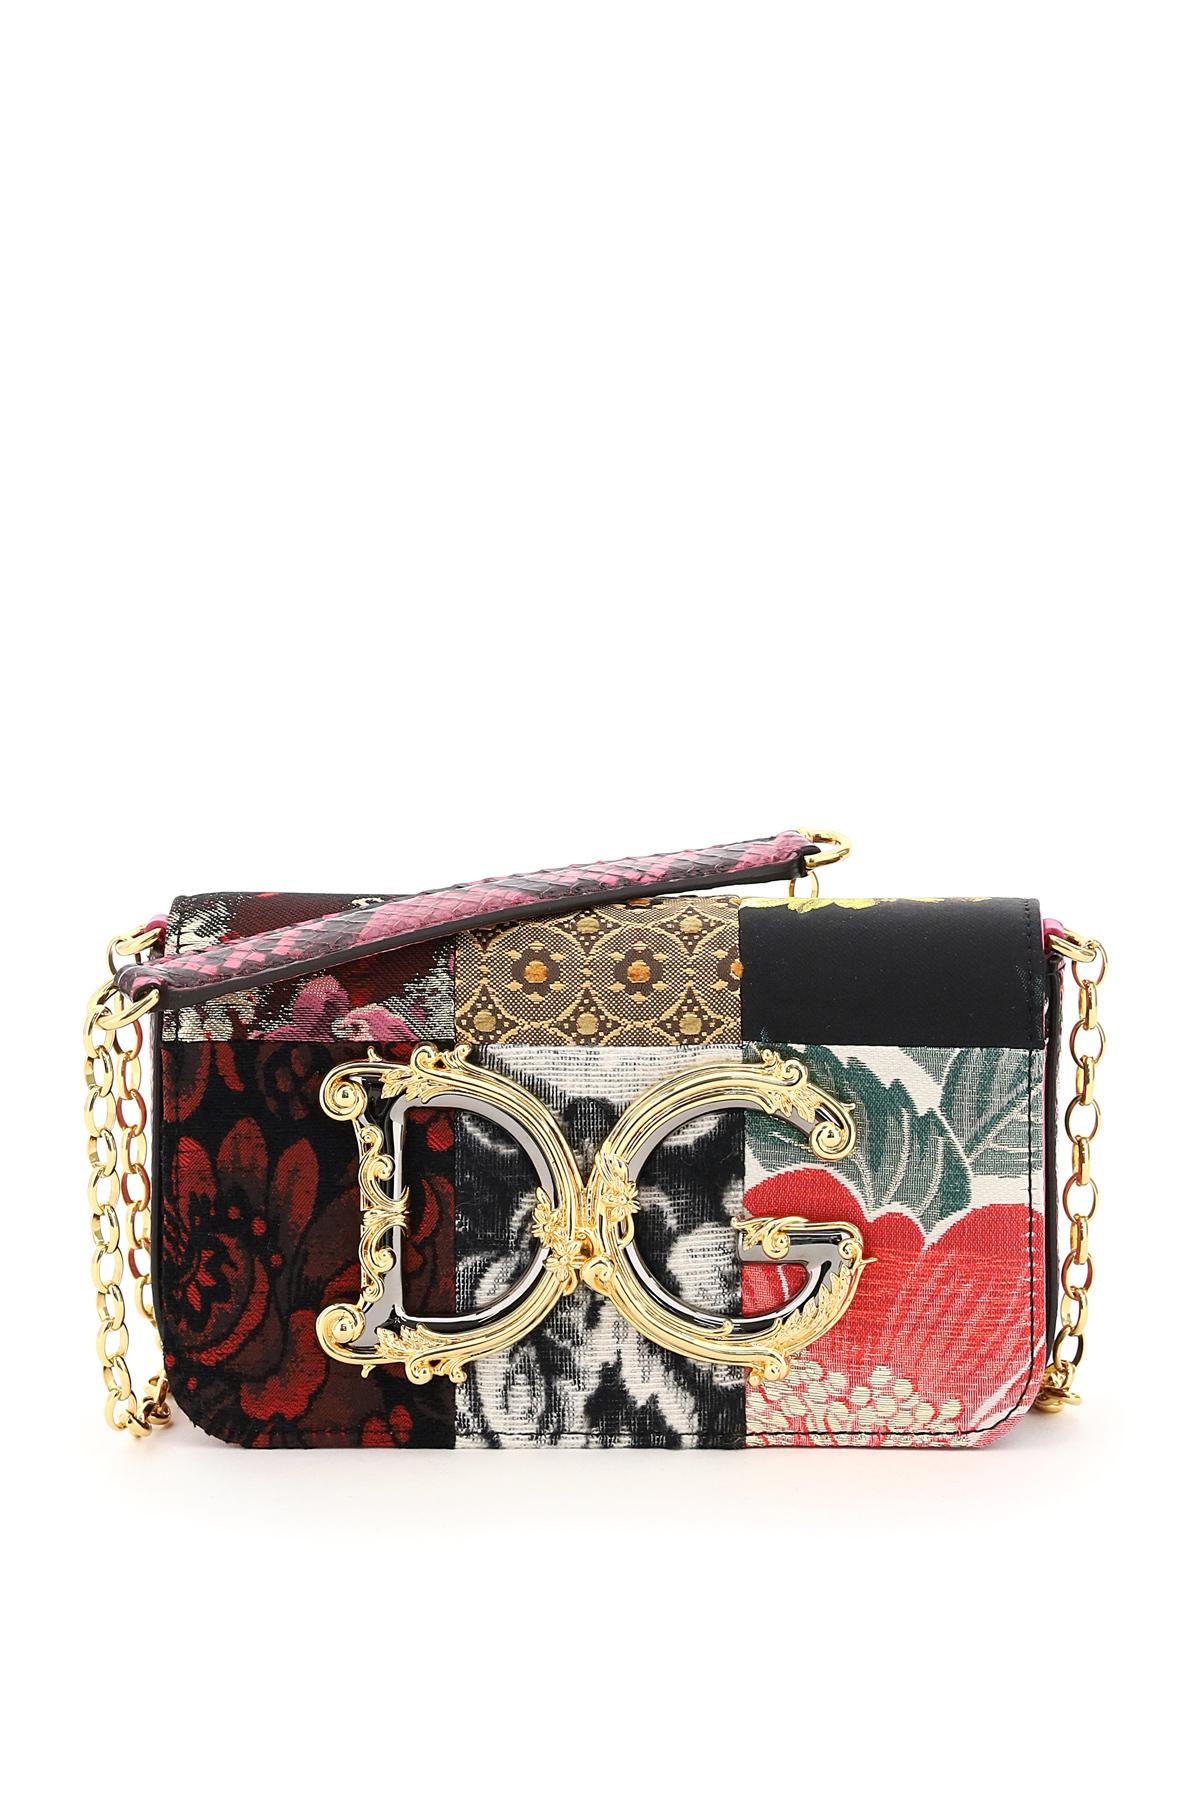 Dolce & gabbana mini bag patchwork dg girl barocco